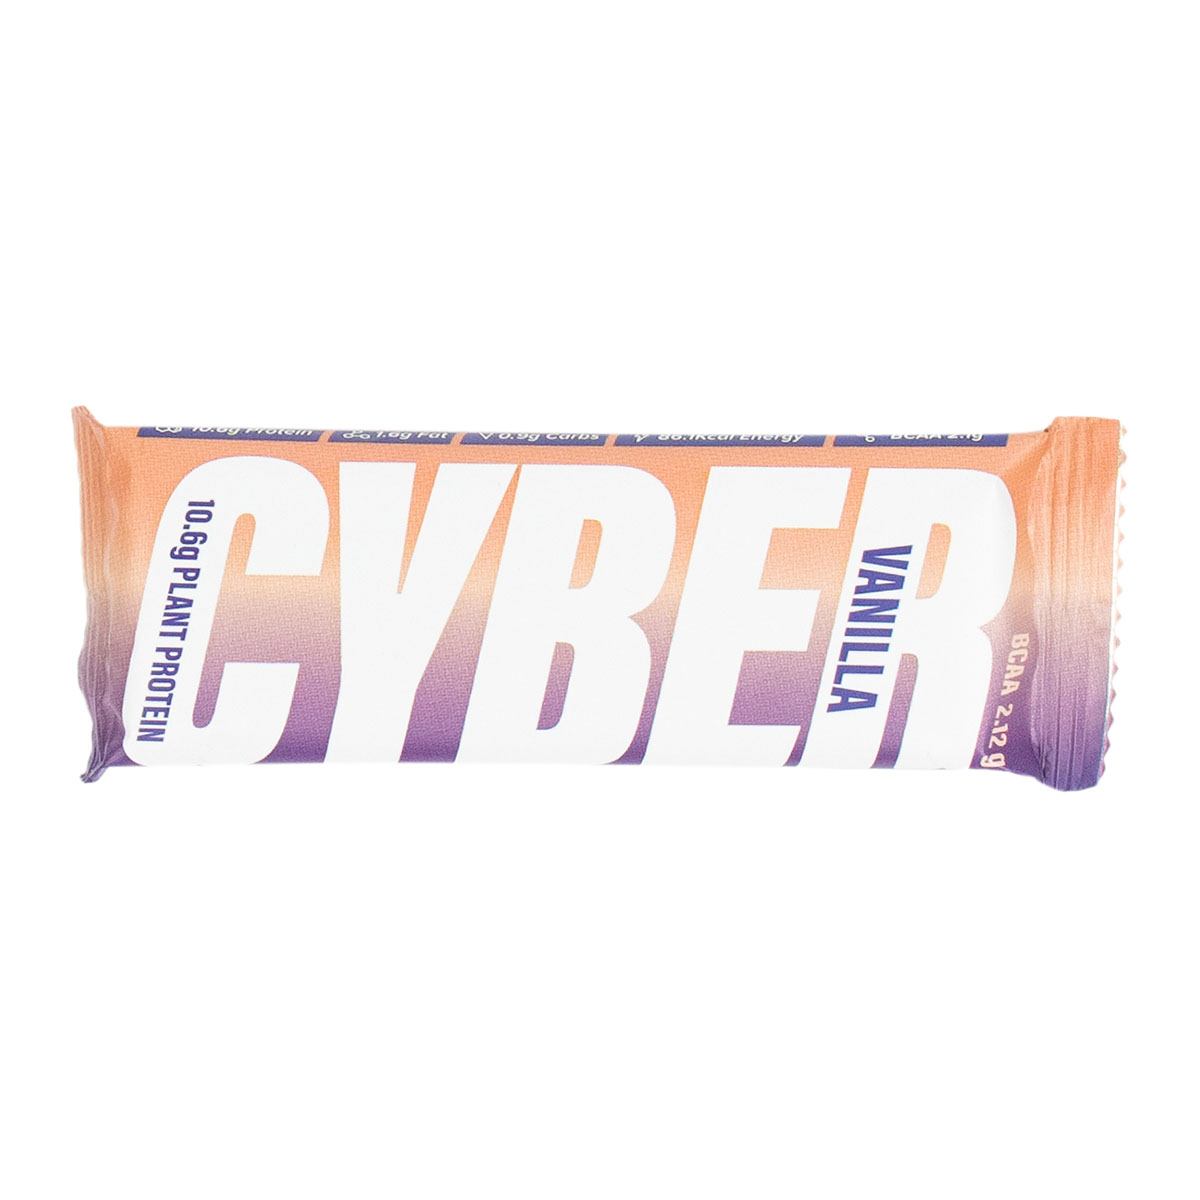 Cyber Bite ваниль